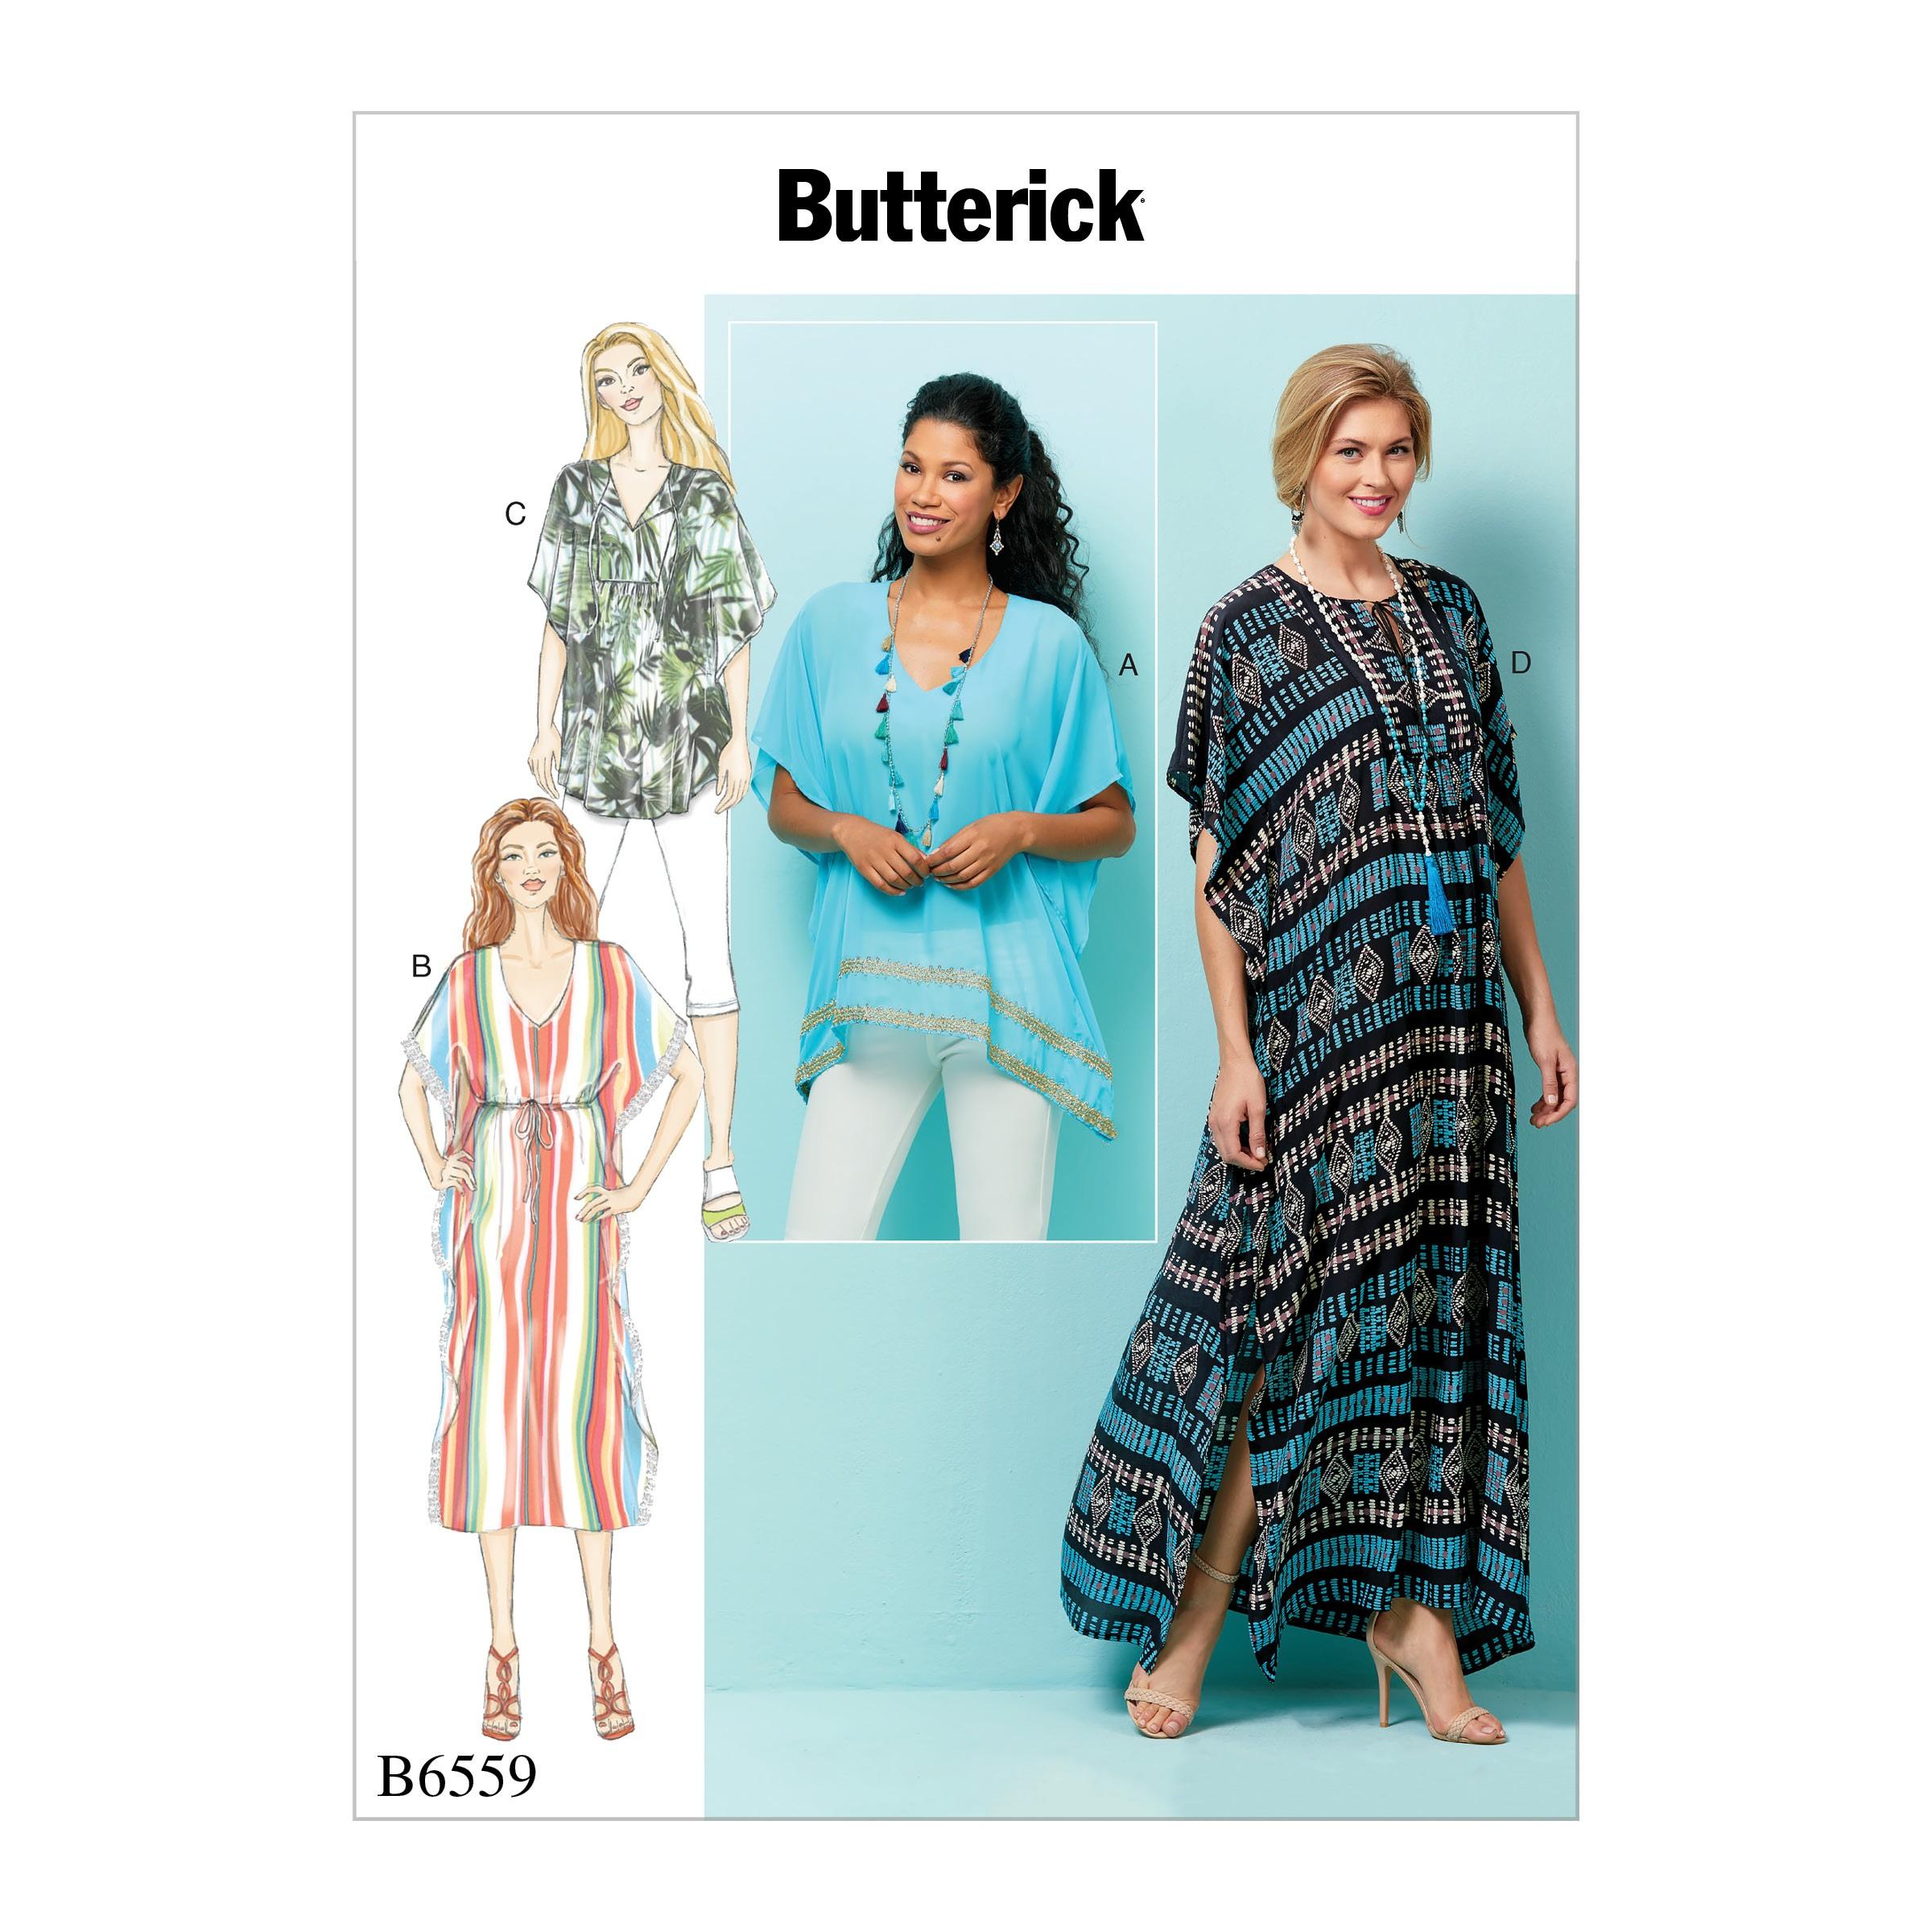 Butterick Sewing Pattern 6559 Women's Loose Fitting Tunic and Dress